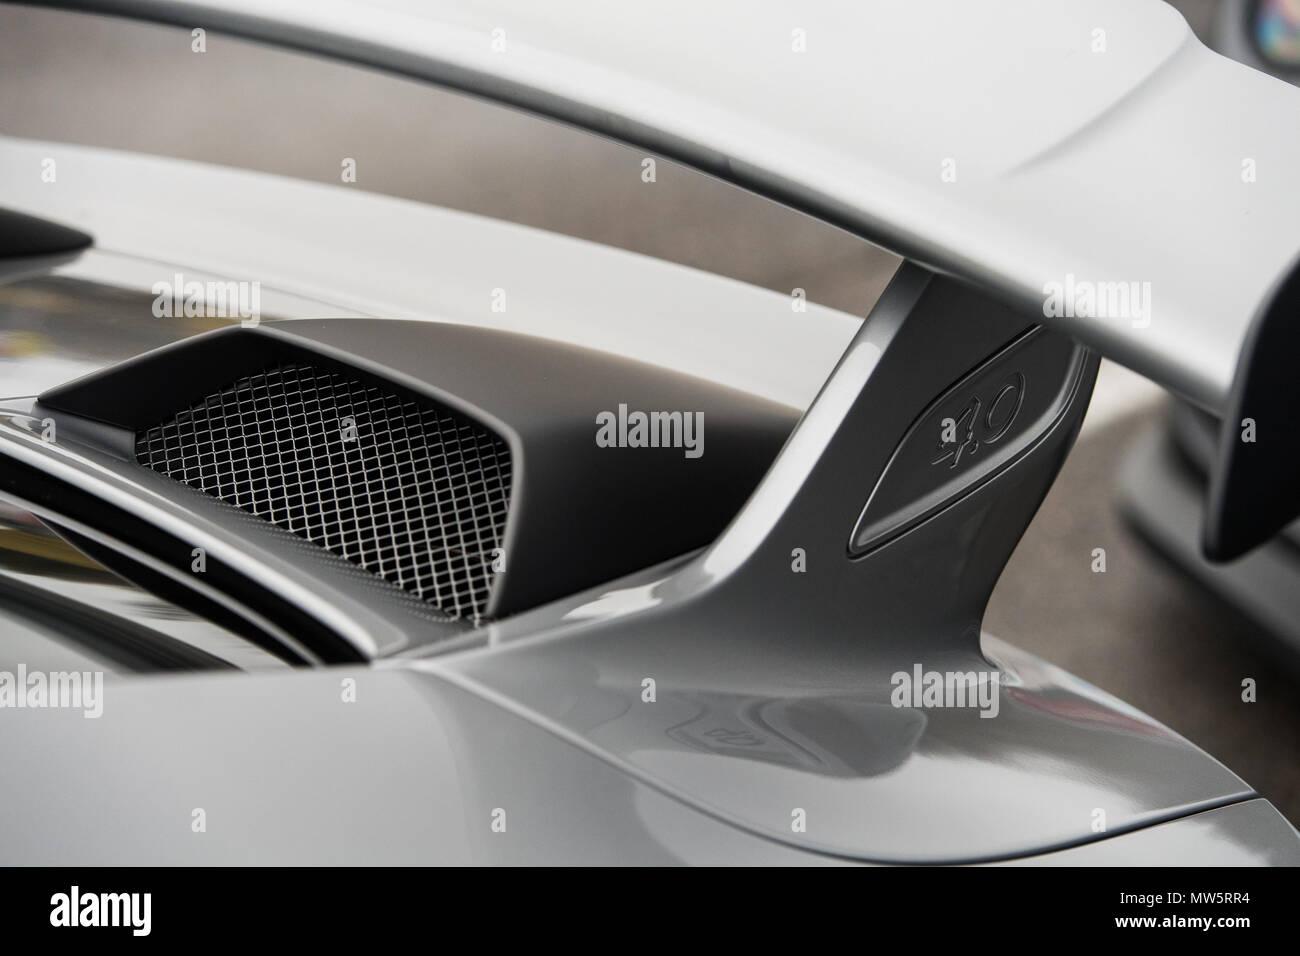 Porsche Gellerasen - Stock Image